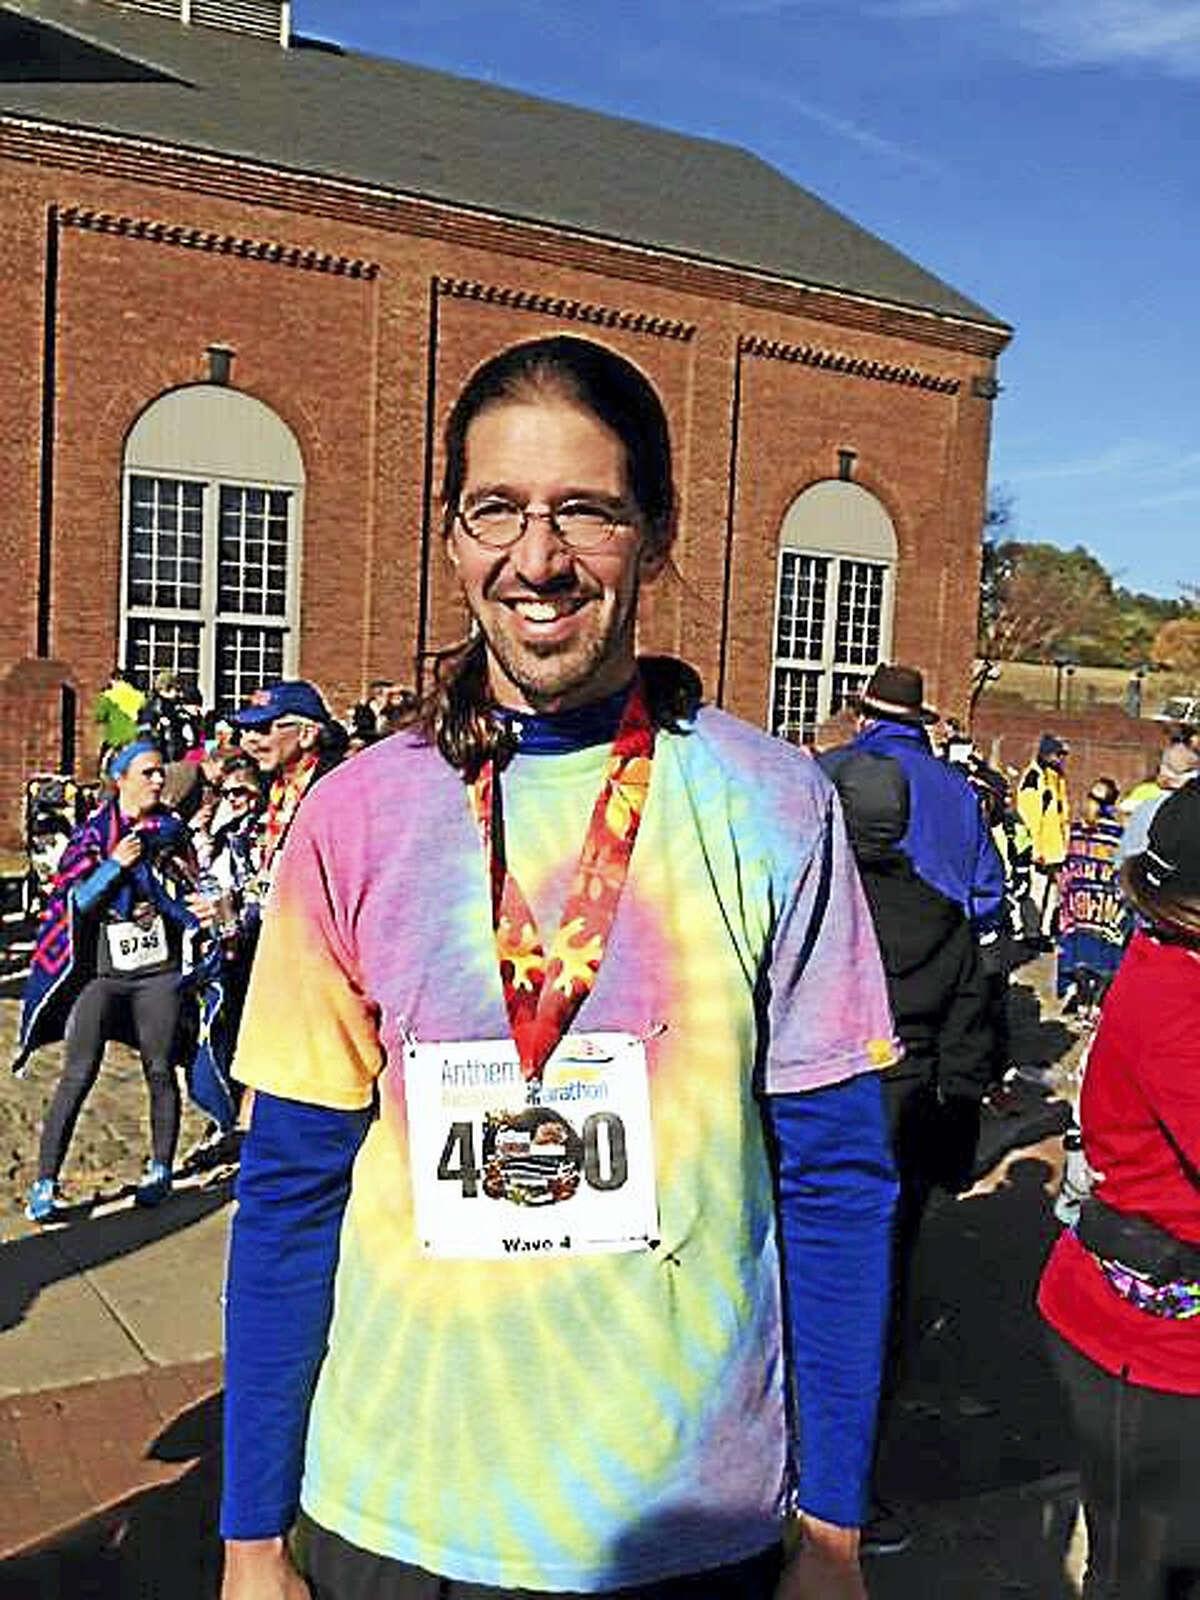 In November 2014, Helin ran the Richmond Marathon in Virginia.